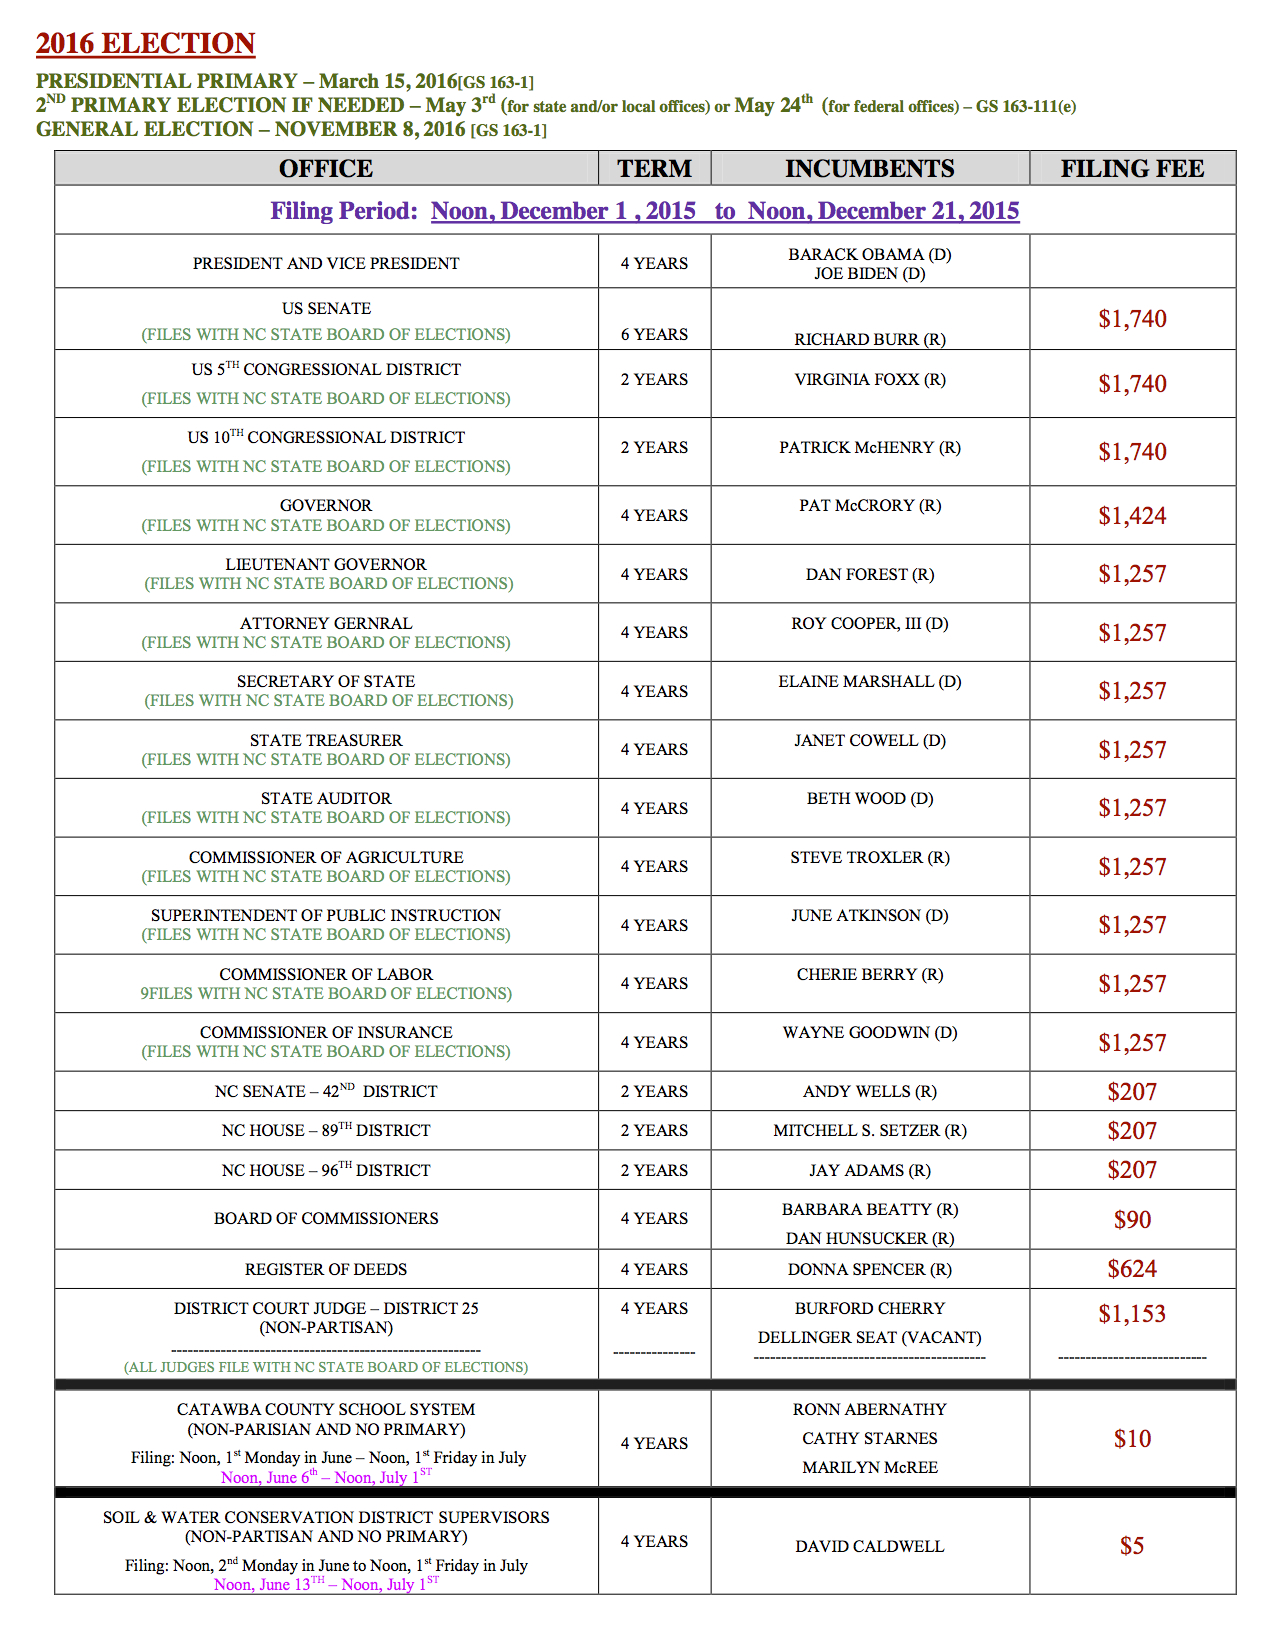 List of Offices on Ballot